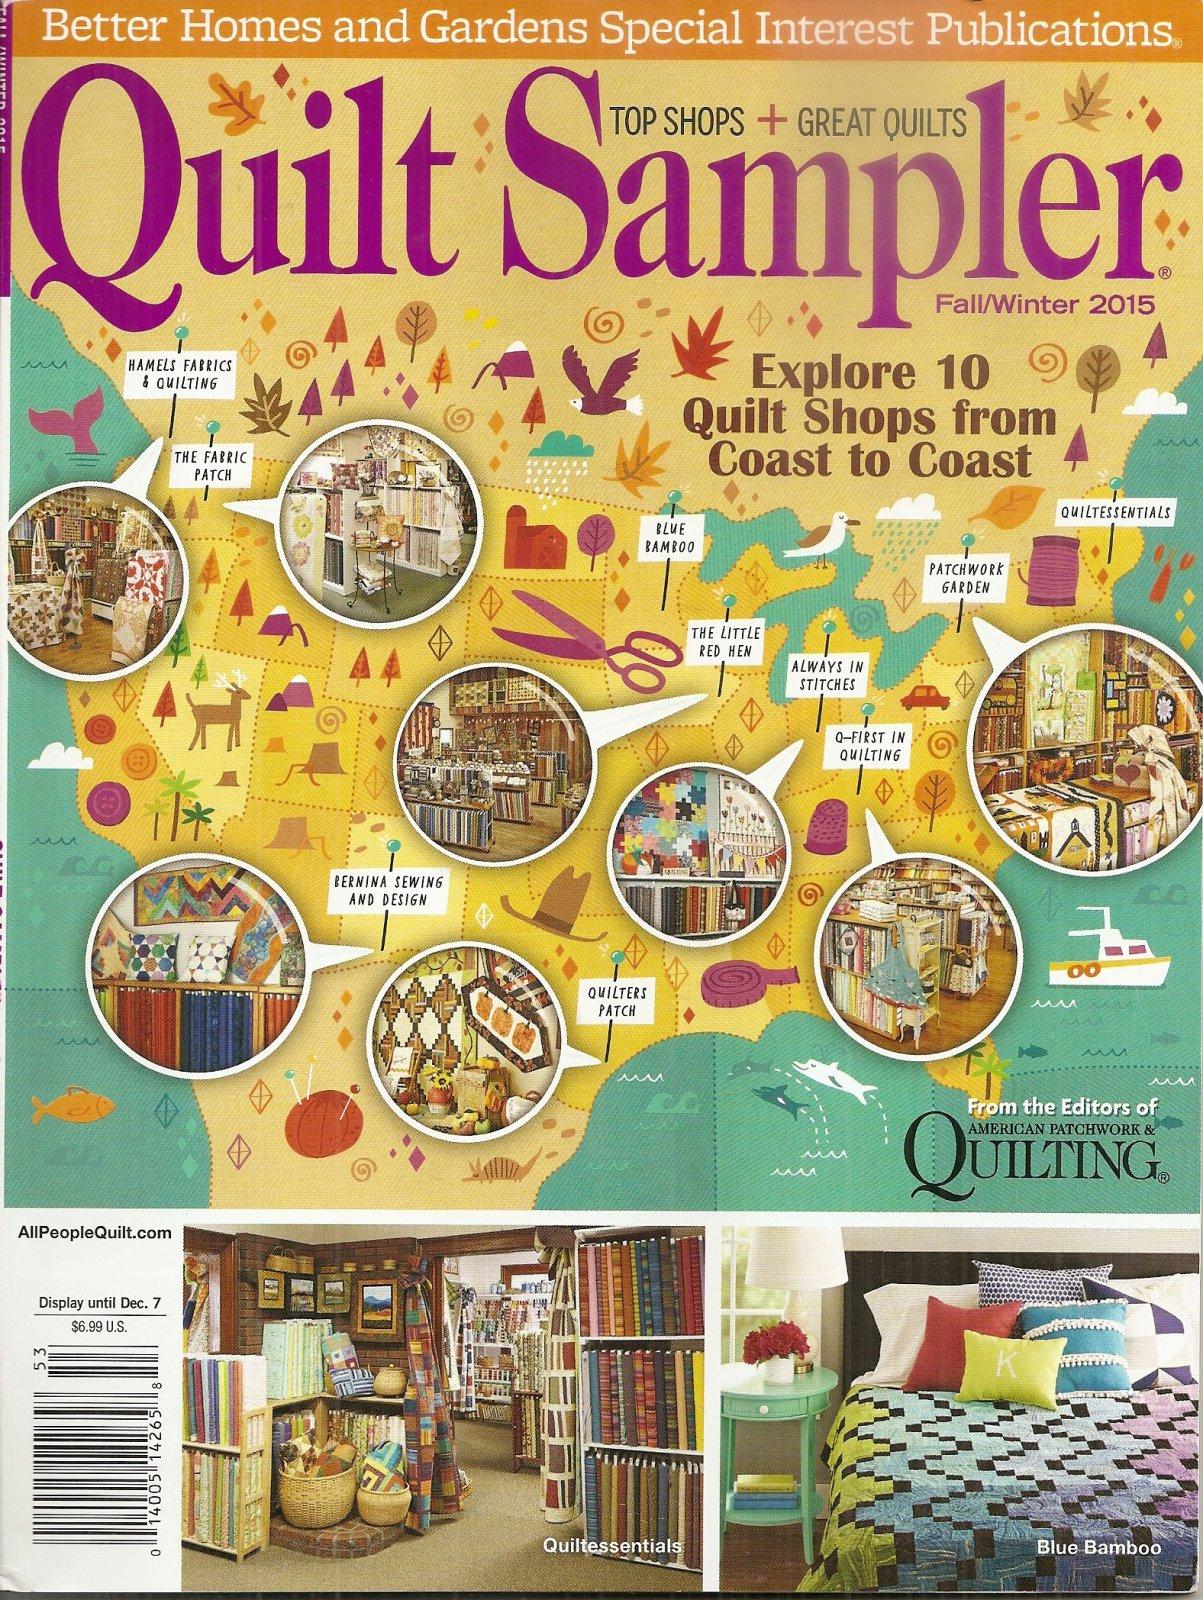 Quilt Sampler Fall/Winter 2015